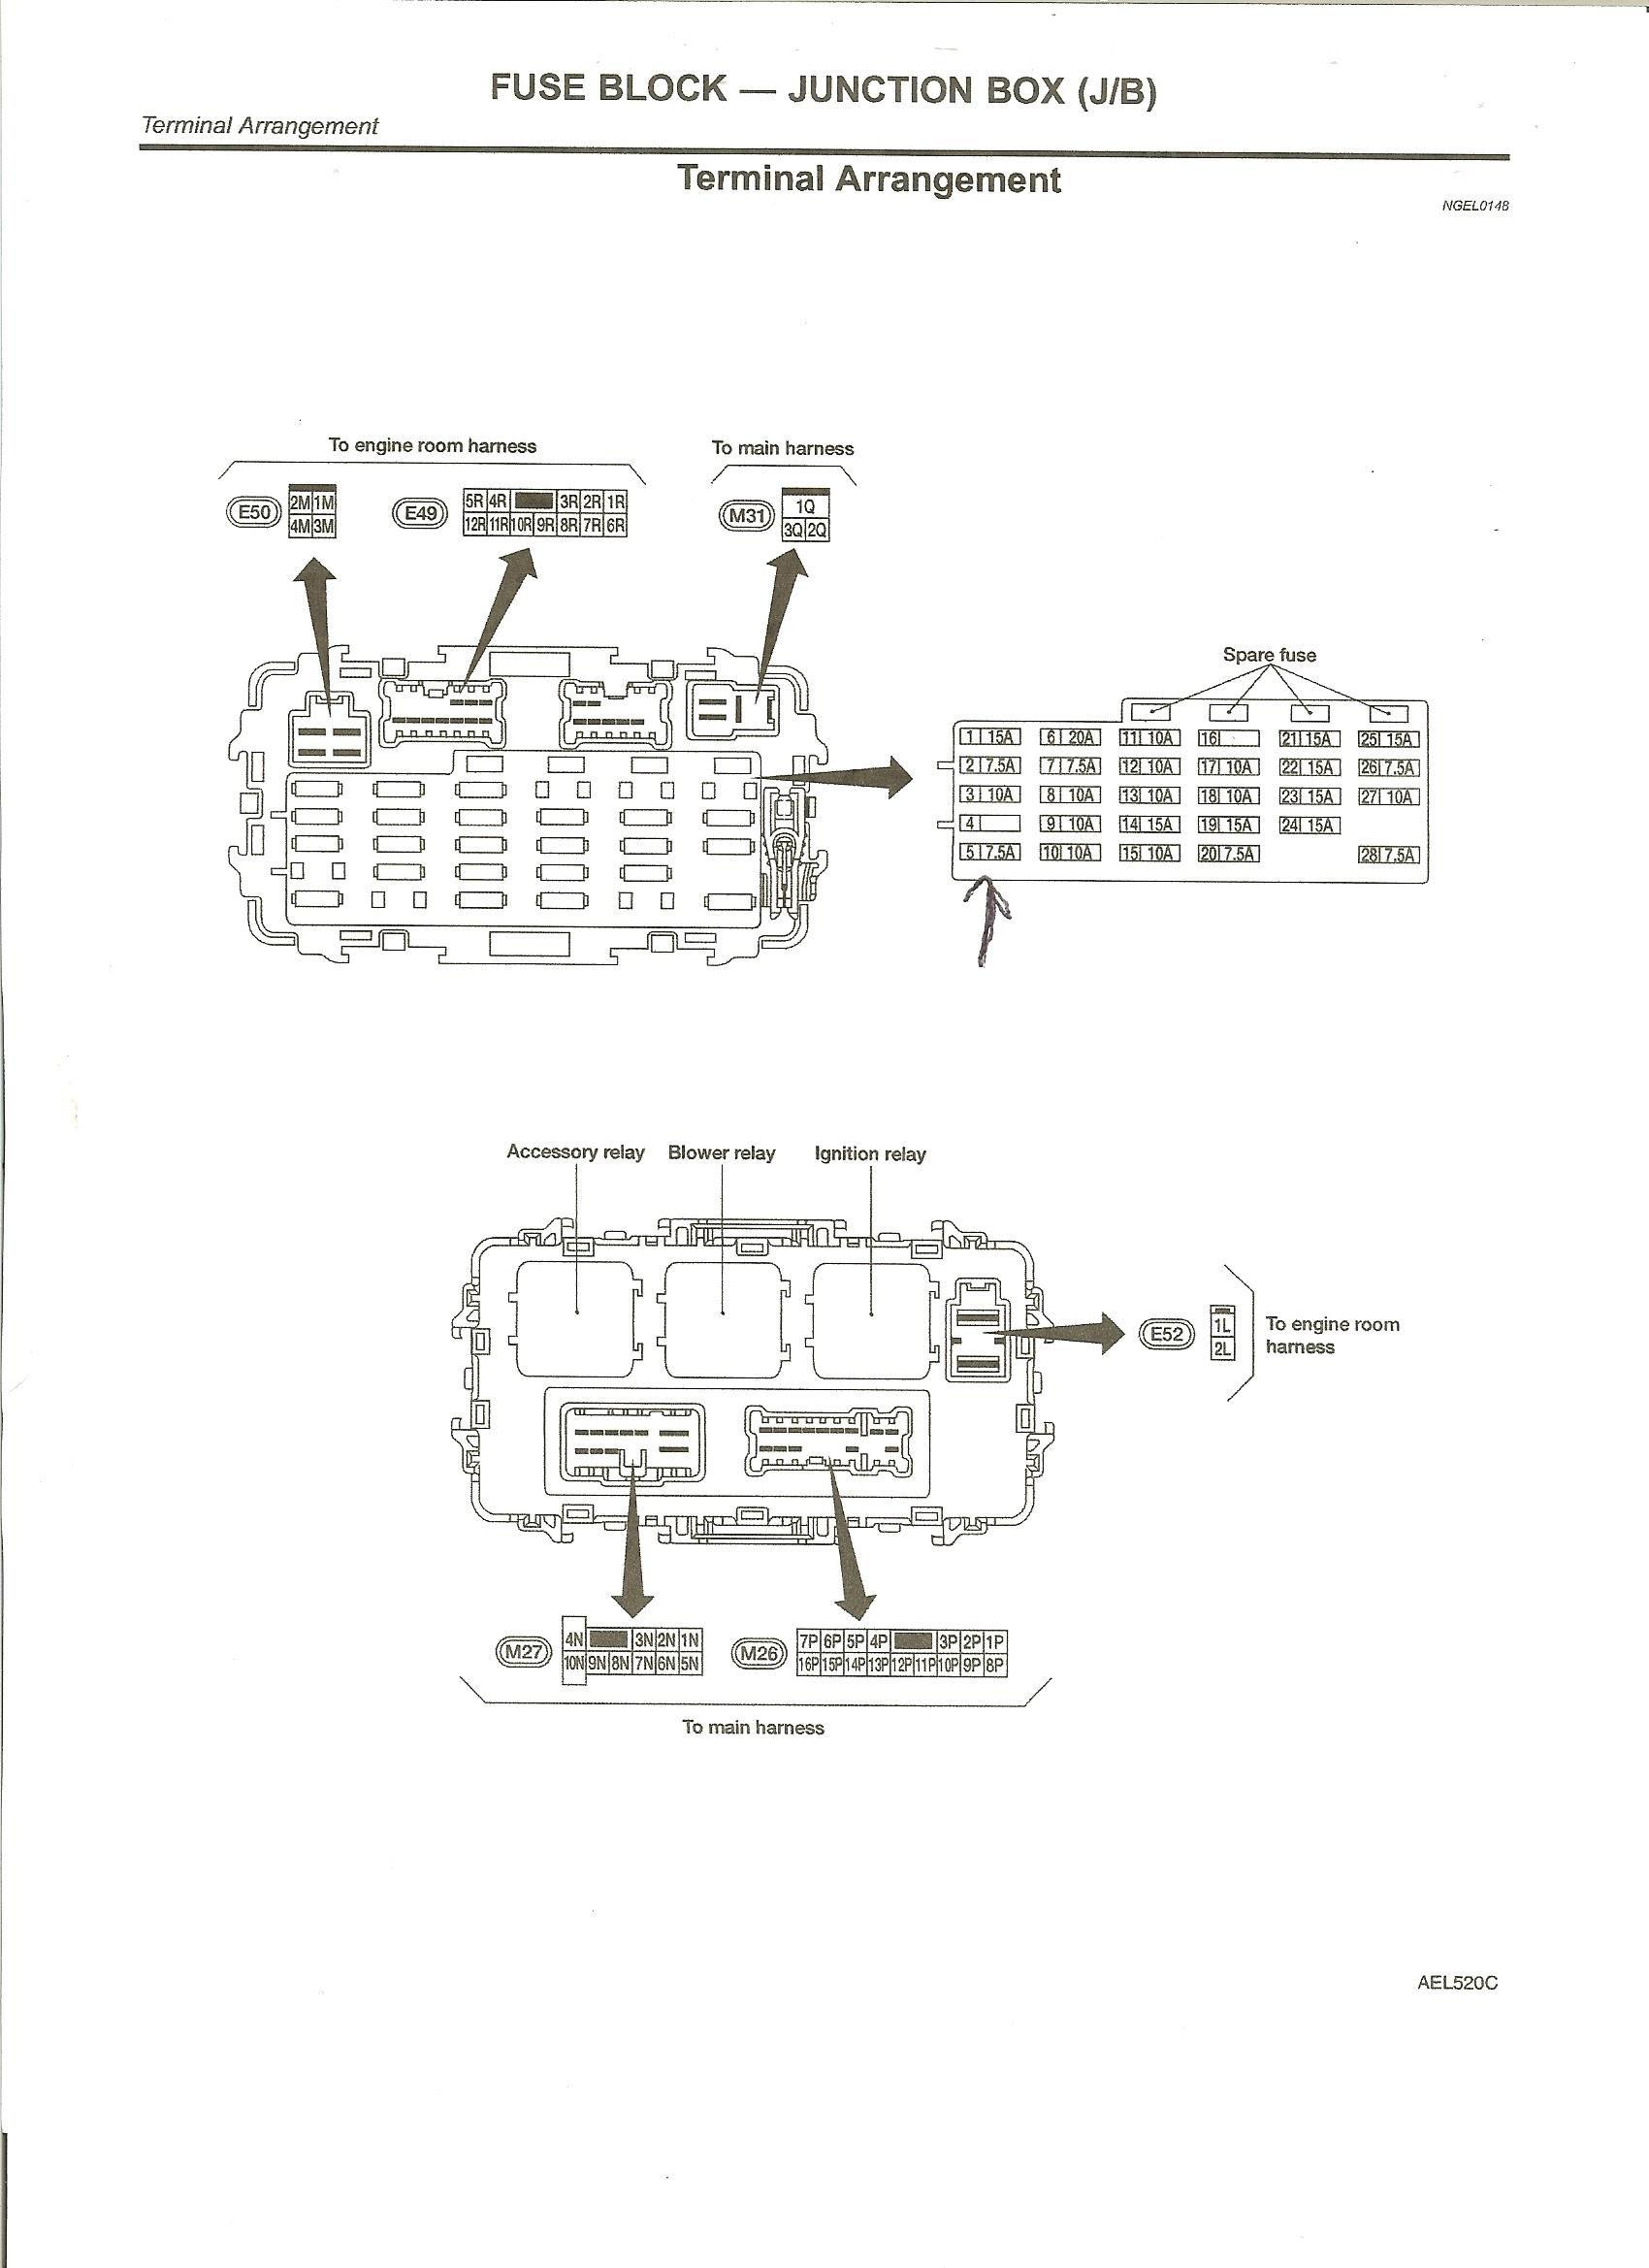 Fuse Box Diagram For 2002 Volkswagen Jettum